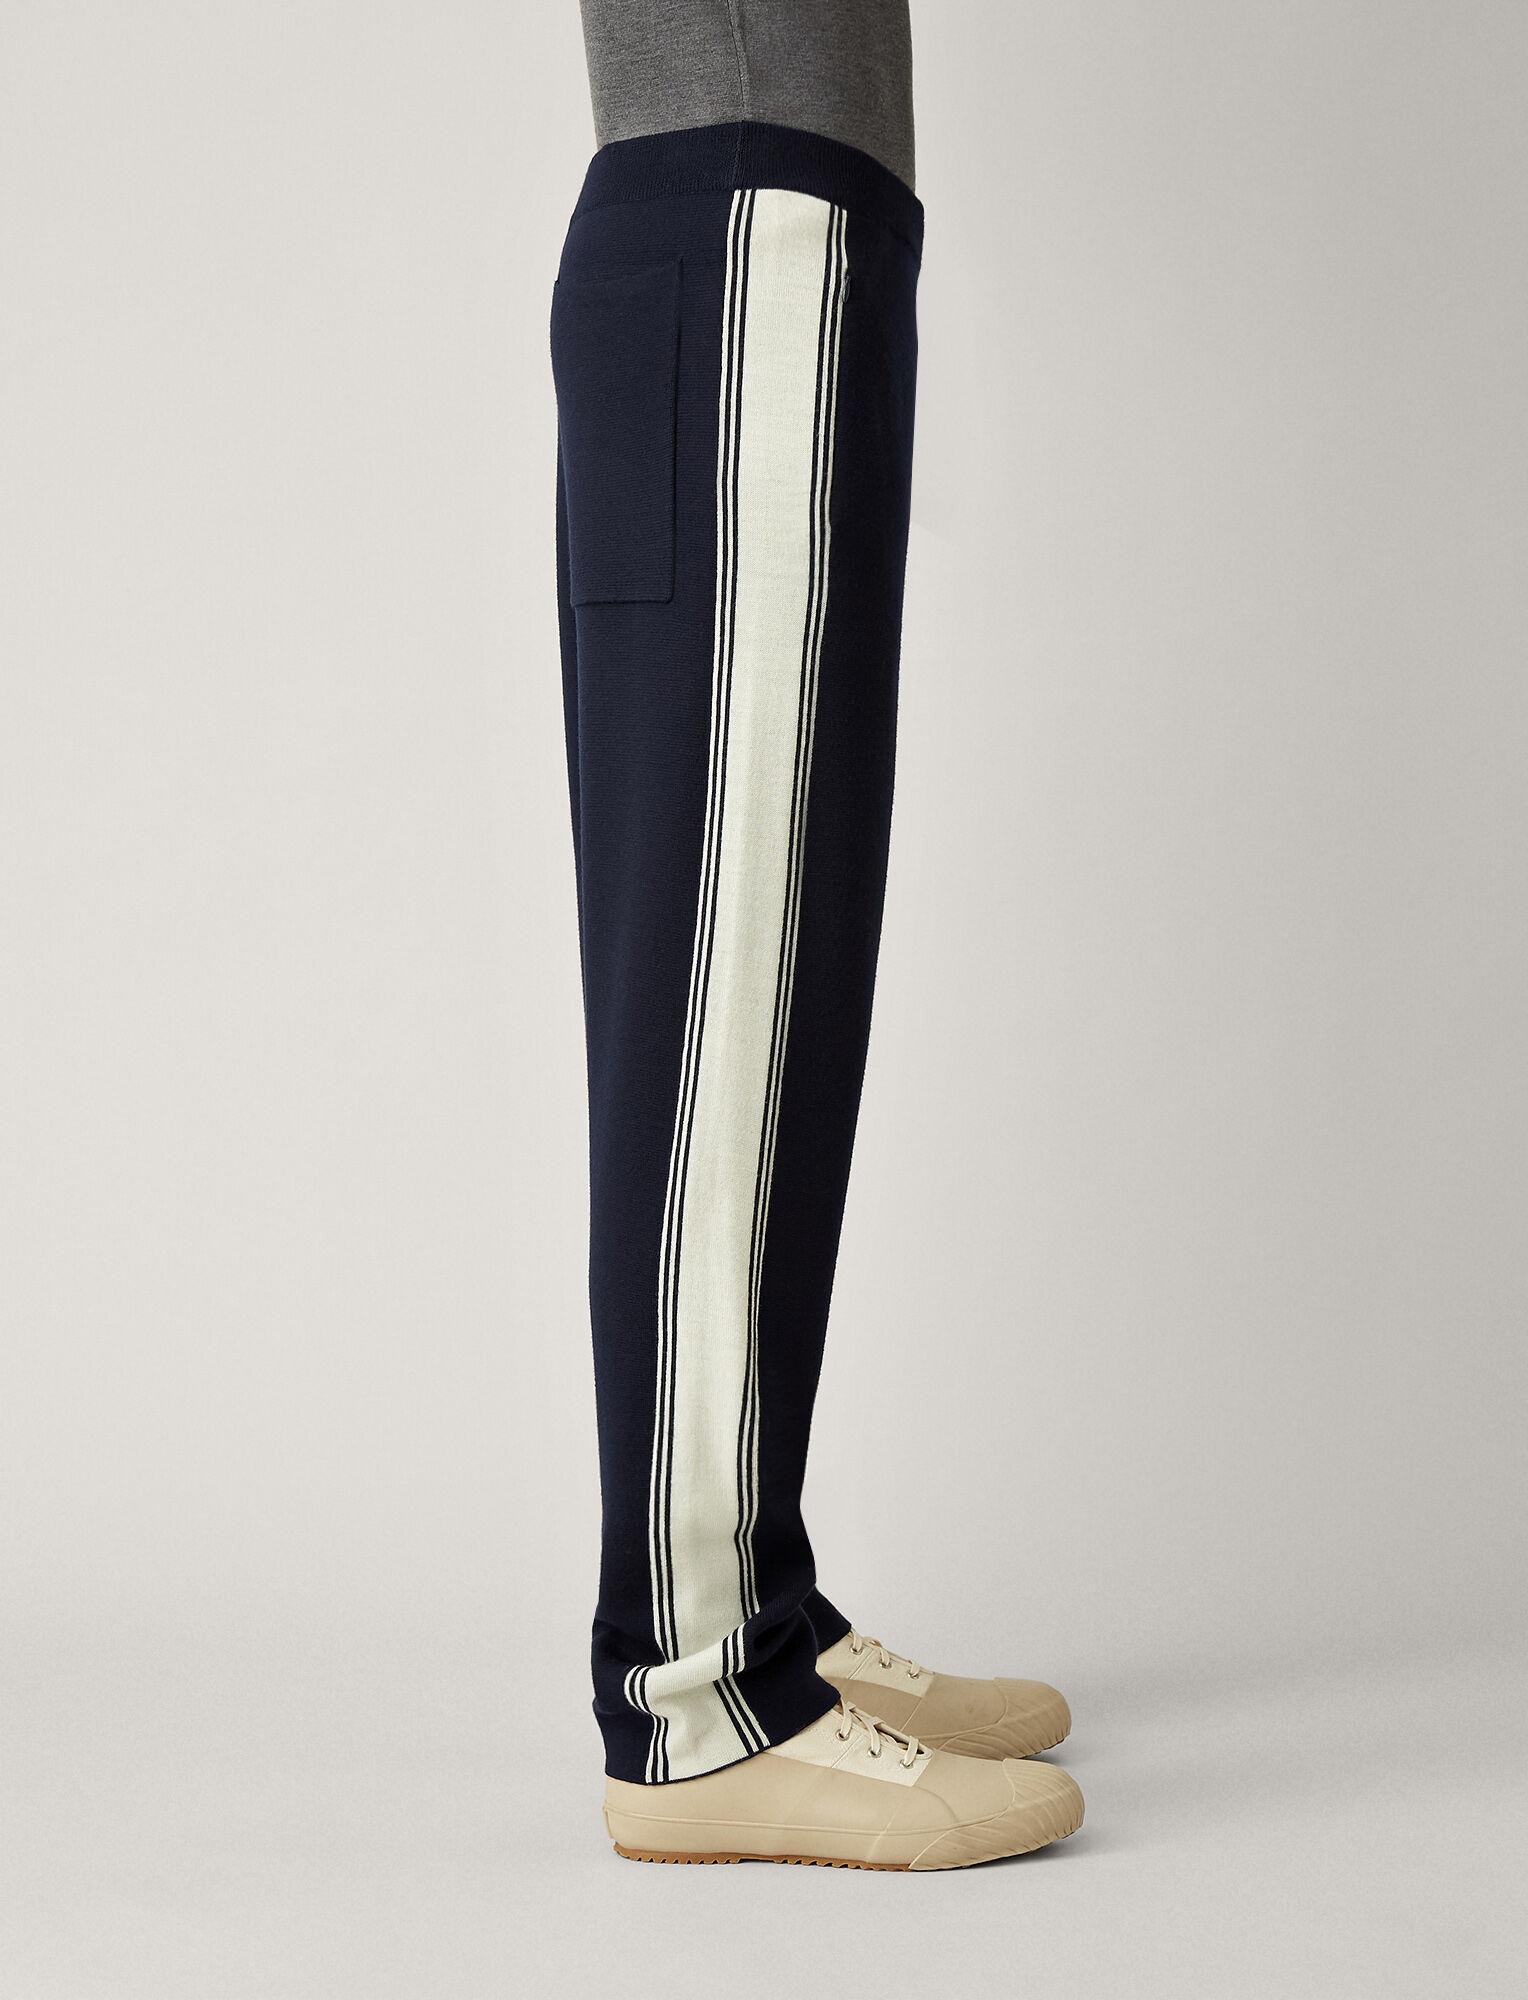 Joseph, Sportwear Milano Knit Jogger, in NAVY